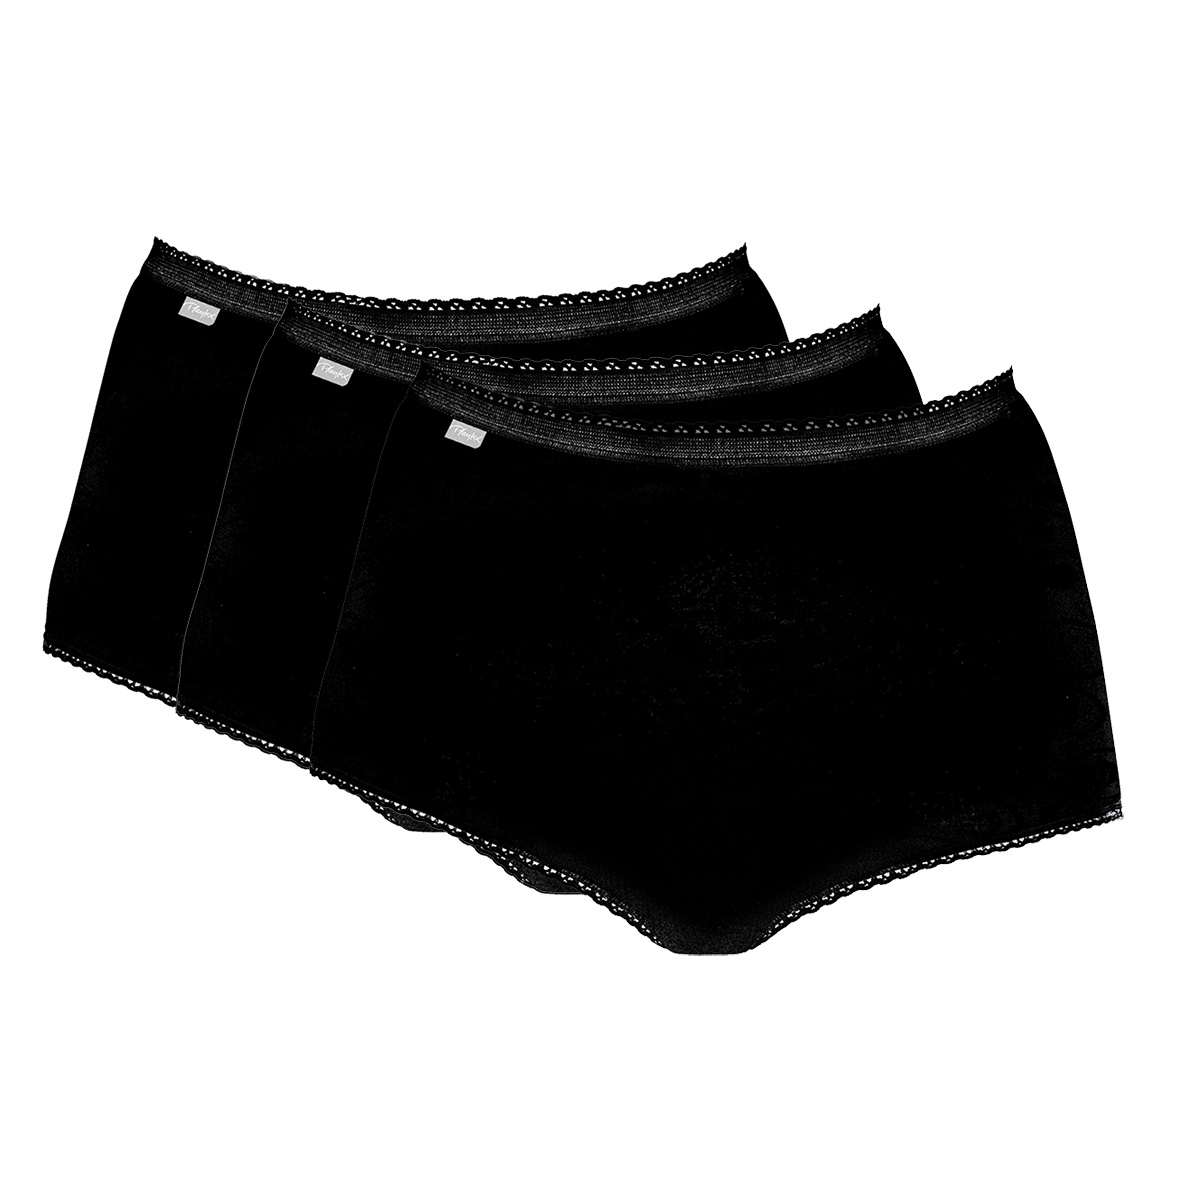 3 Culottes Maxi noires  – Coton Stretch-PLAYTEX